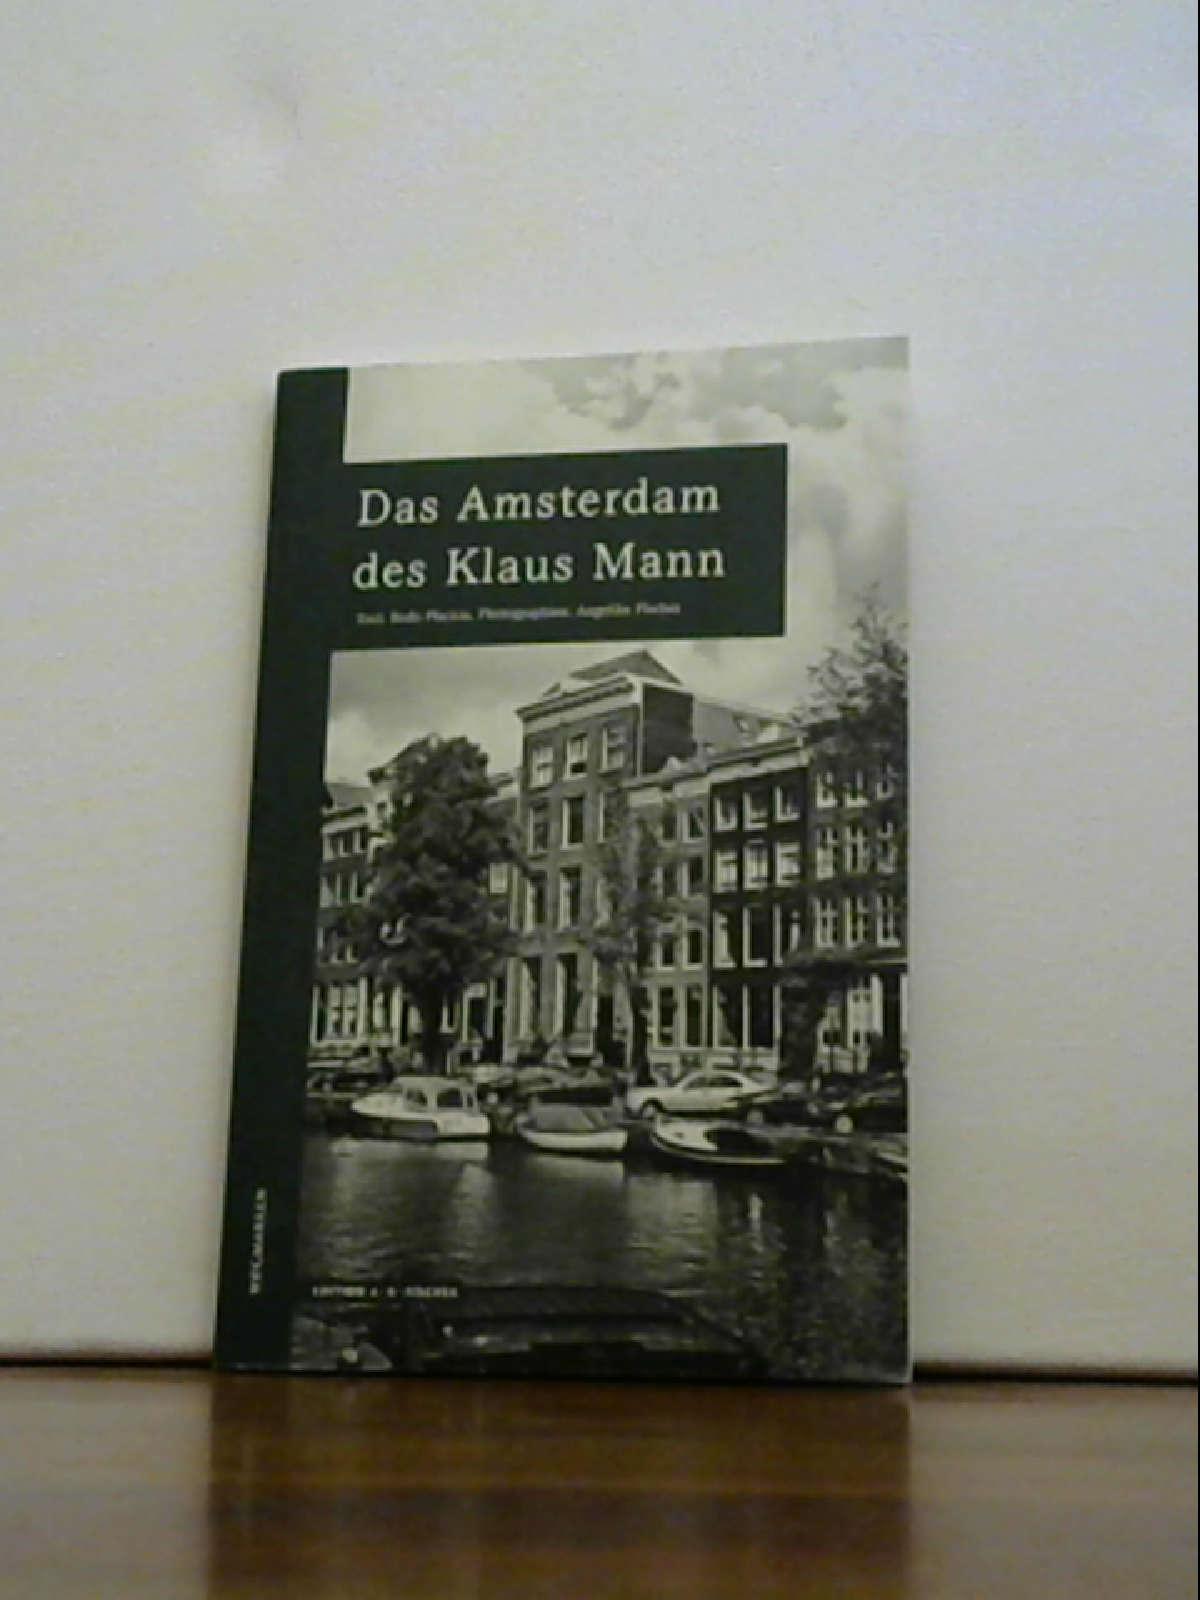 Das Amsterdam des Klaus Mann (WEGMARKEN. Lebenswege: Bodo, Plachta,: